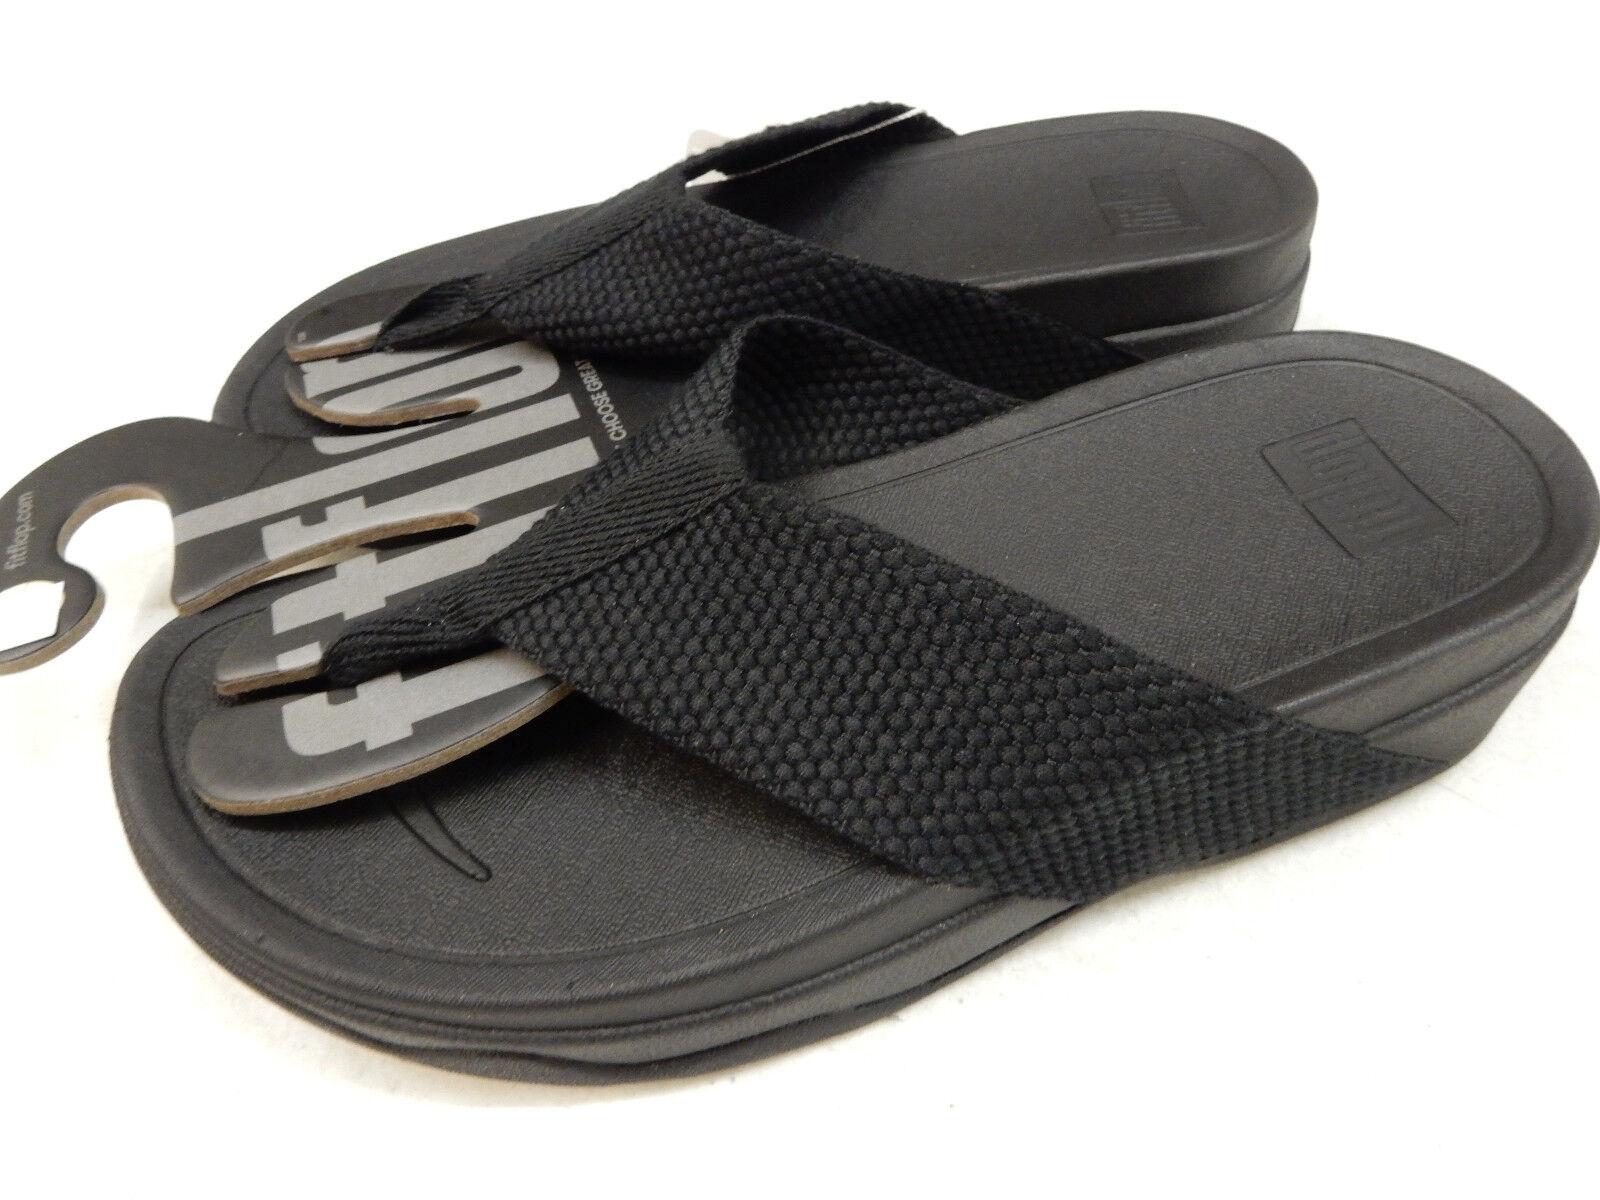 FITFLOP Damenschuhe SANDALS SURFA BLACK SIZE 9